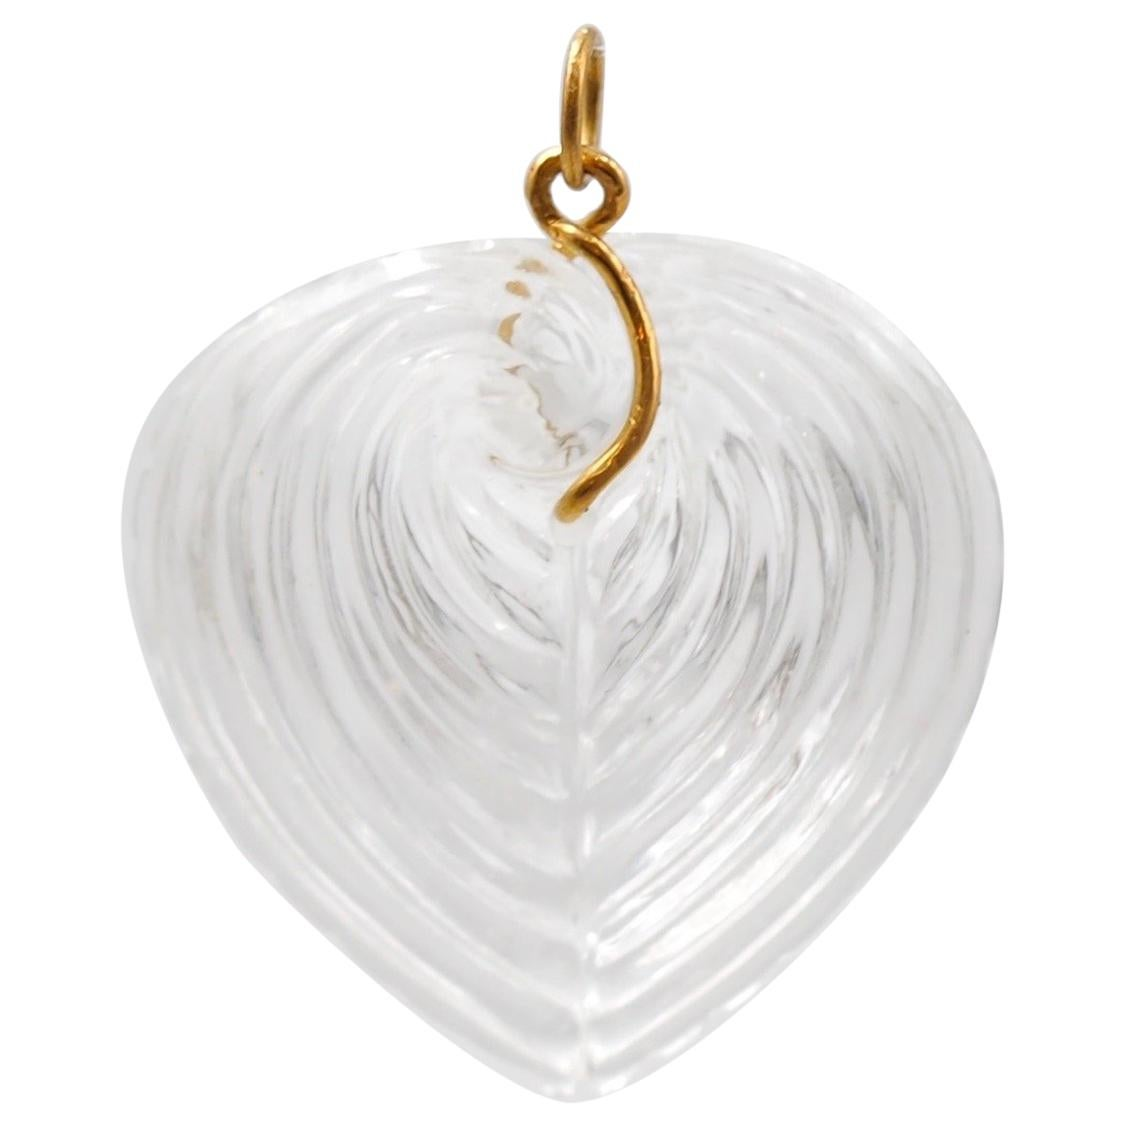 Hand Carved Rock Crystal Large Heart Shell 22 Karat Gold Pendant